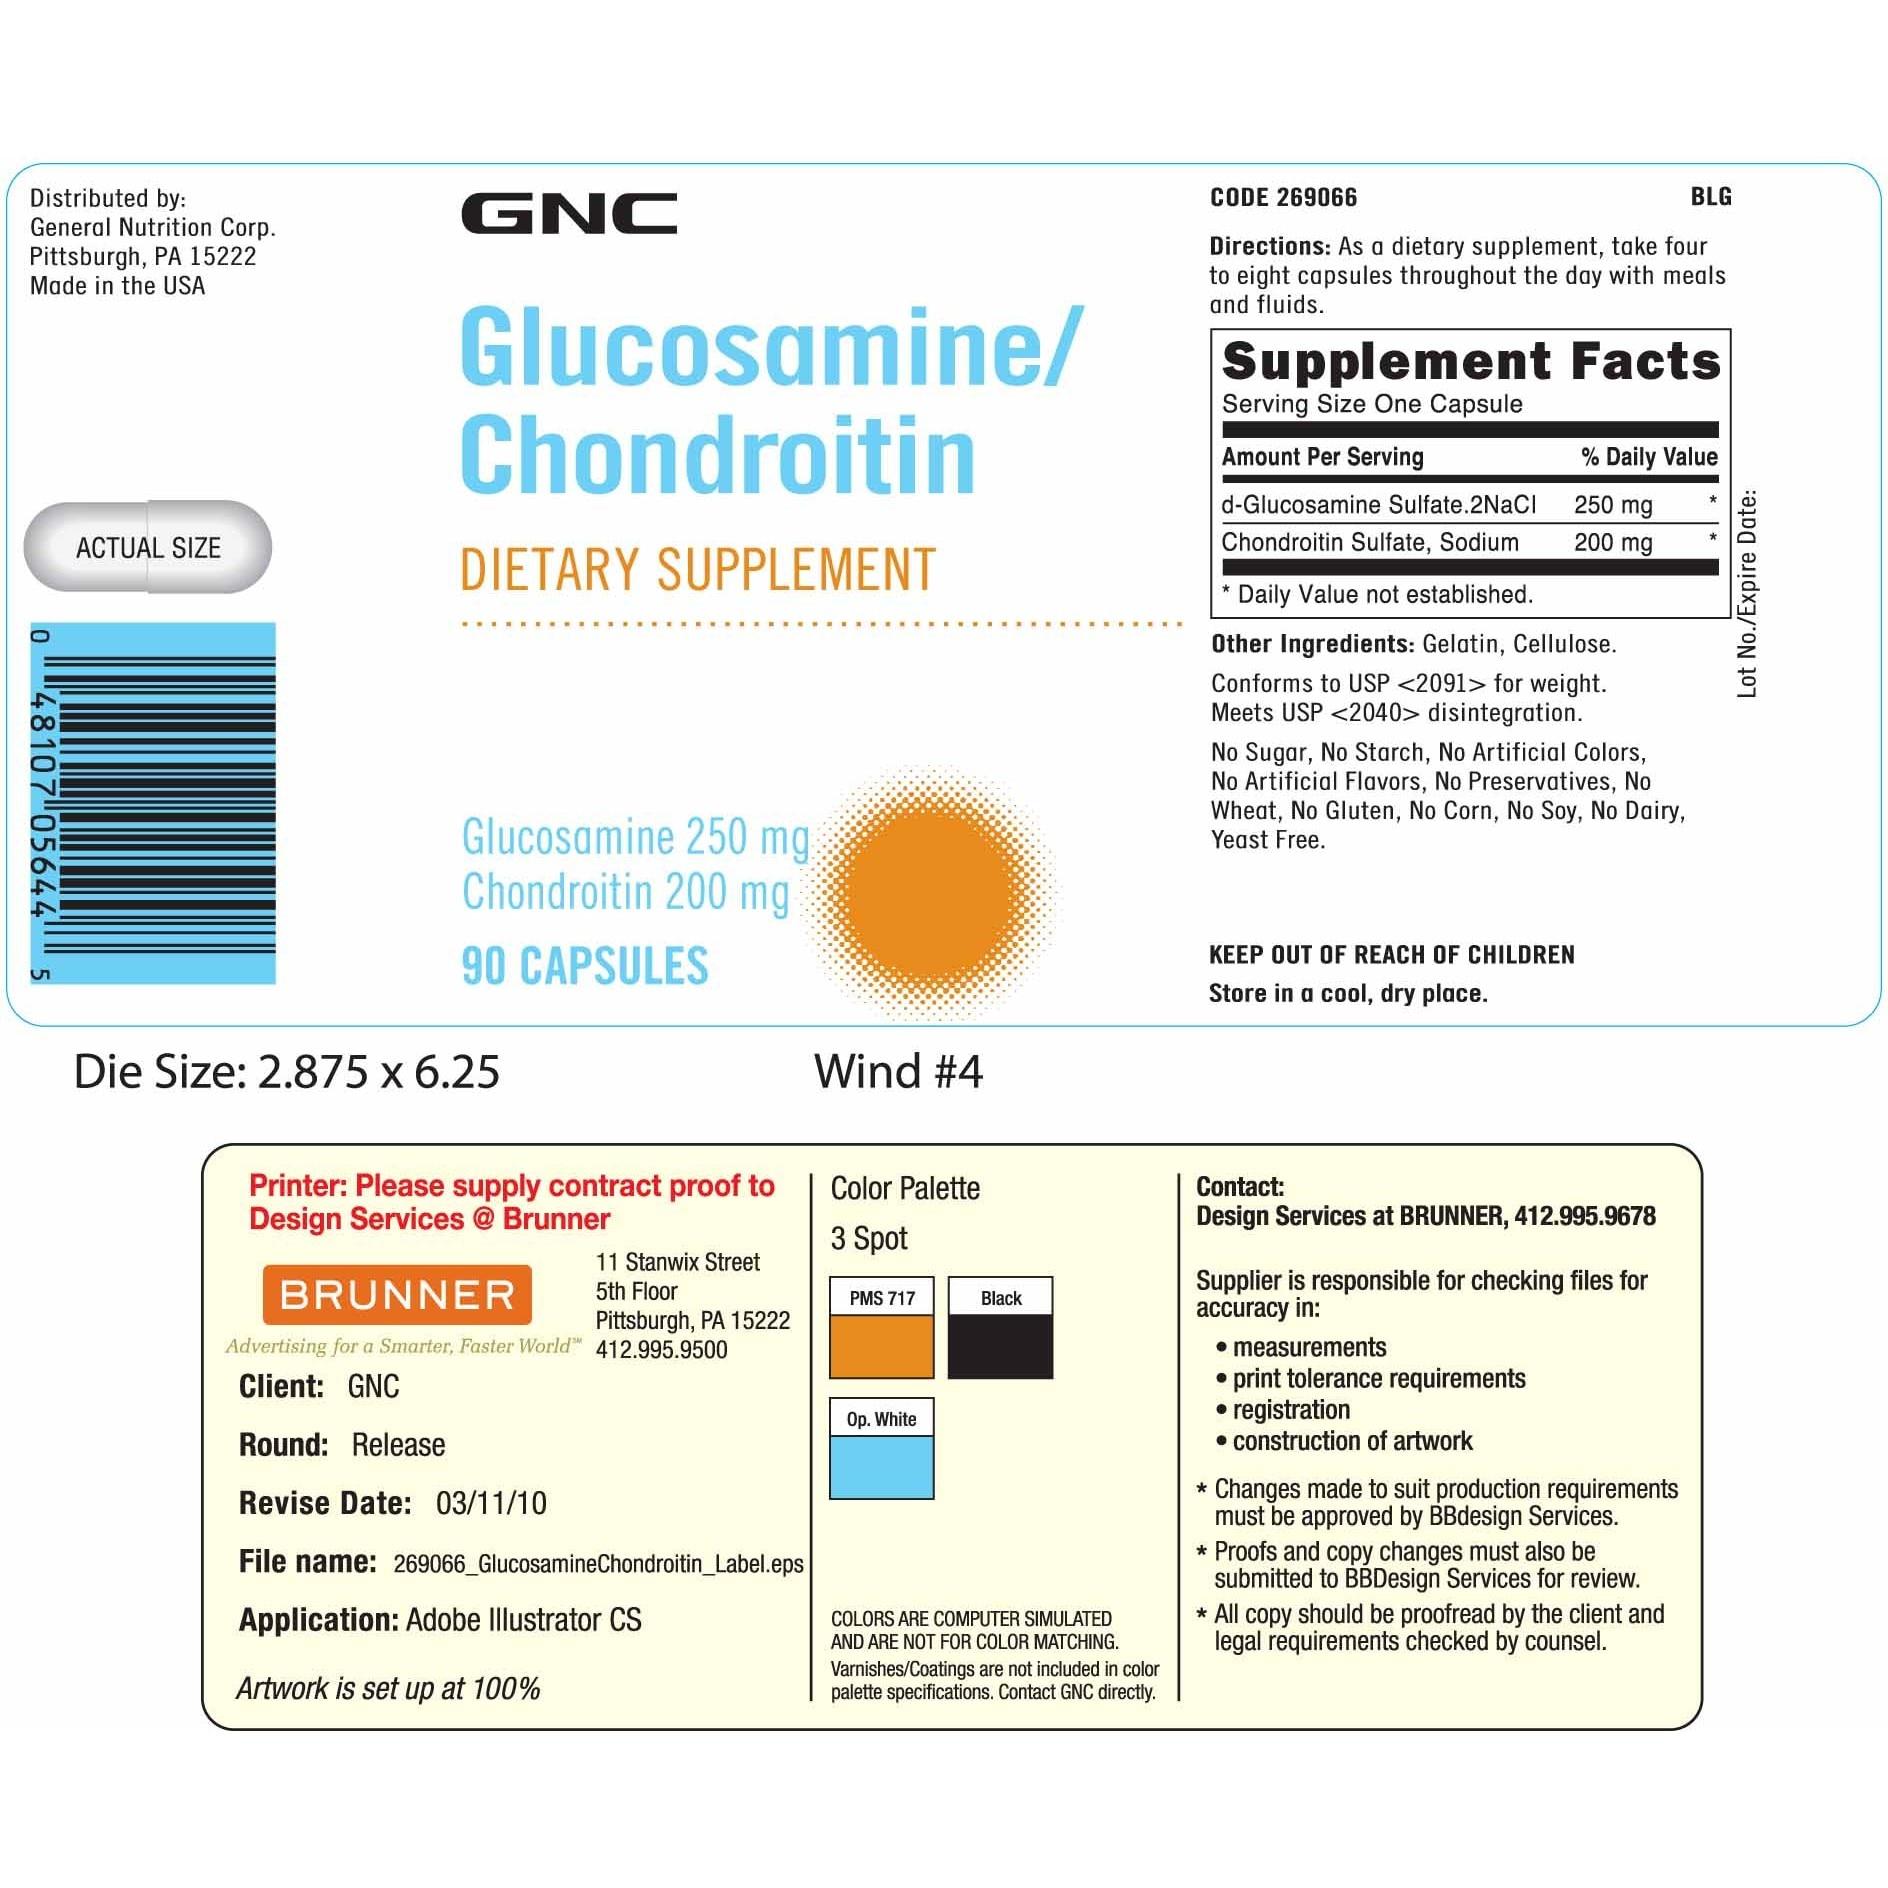 Glucosamine Chondroitin Hy 60 Capsule